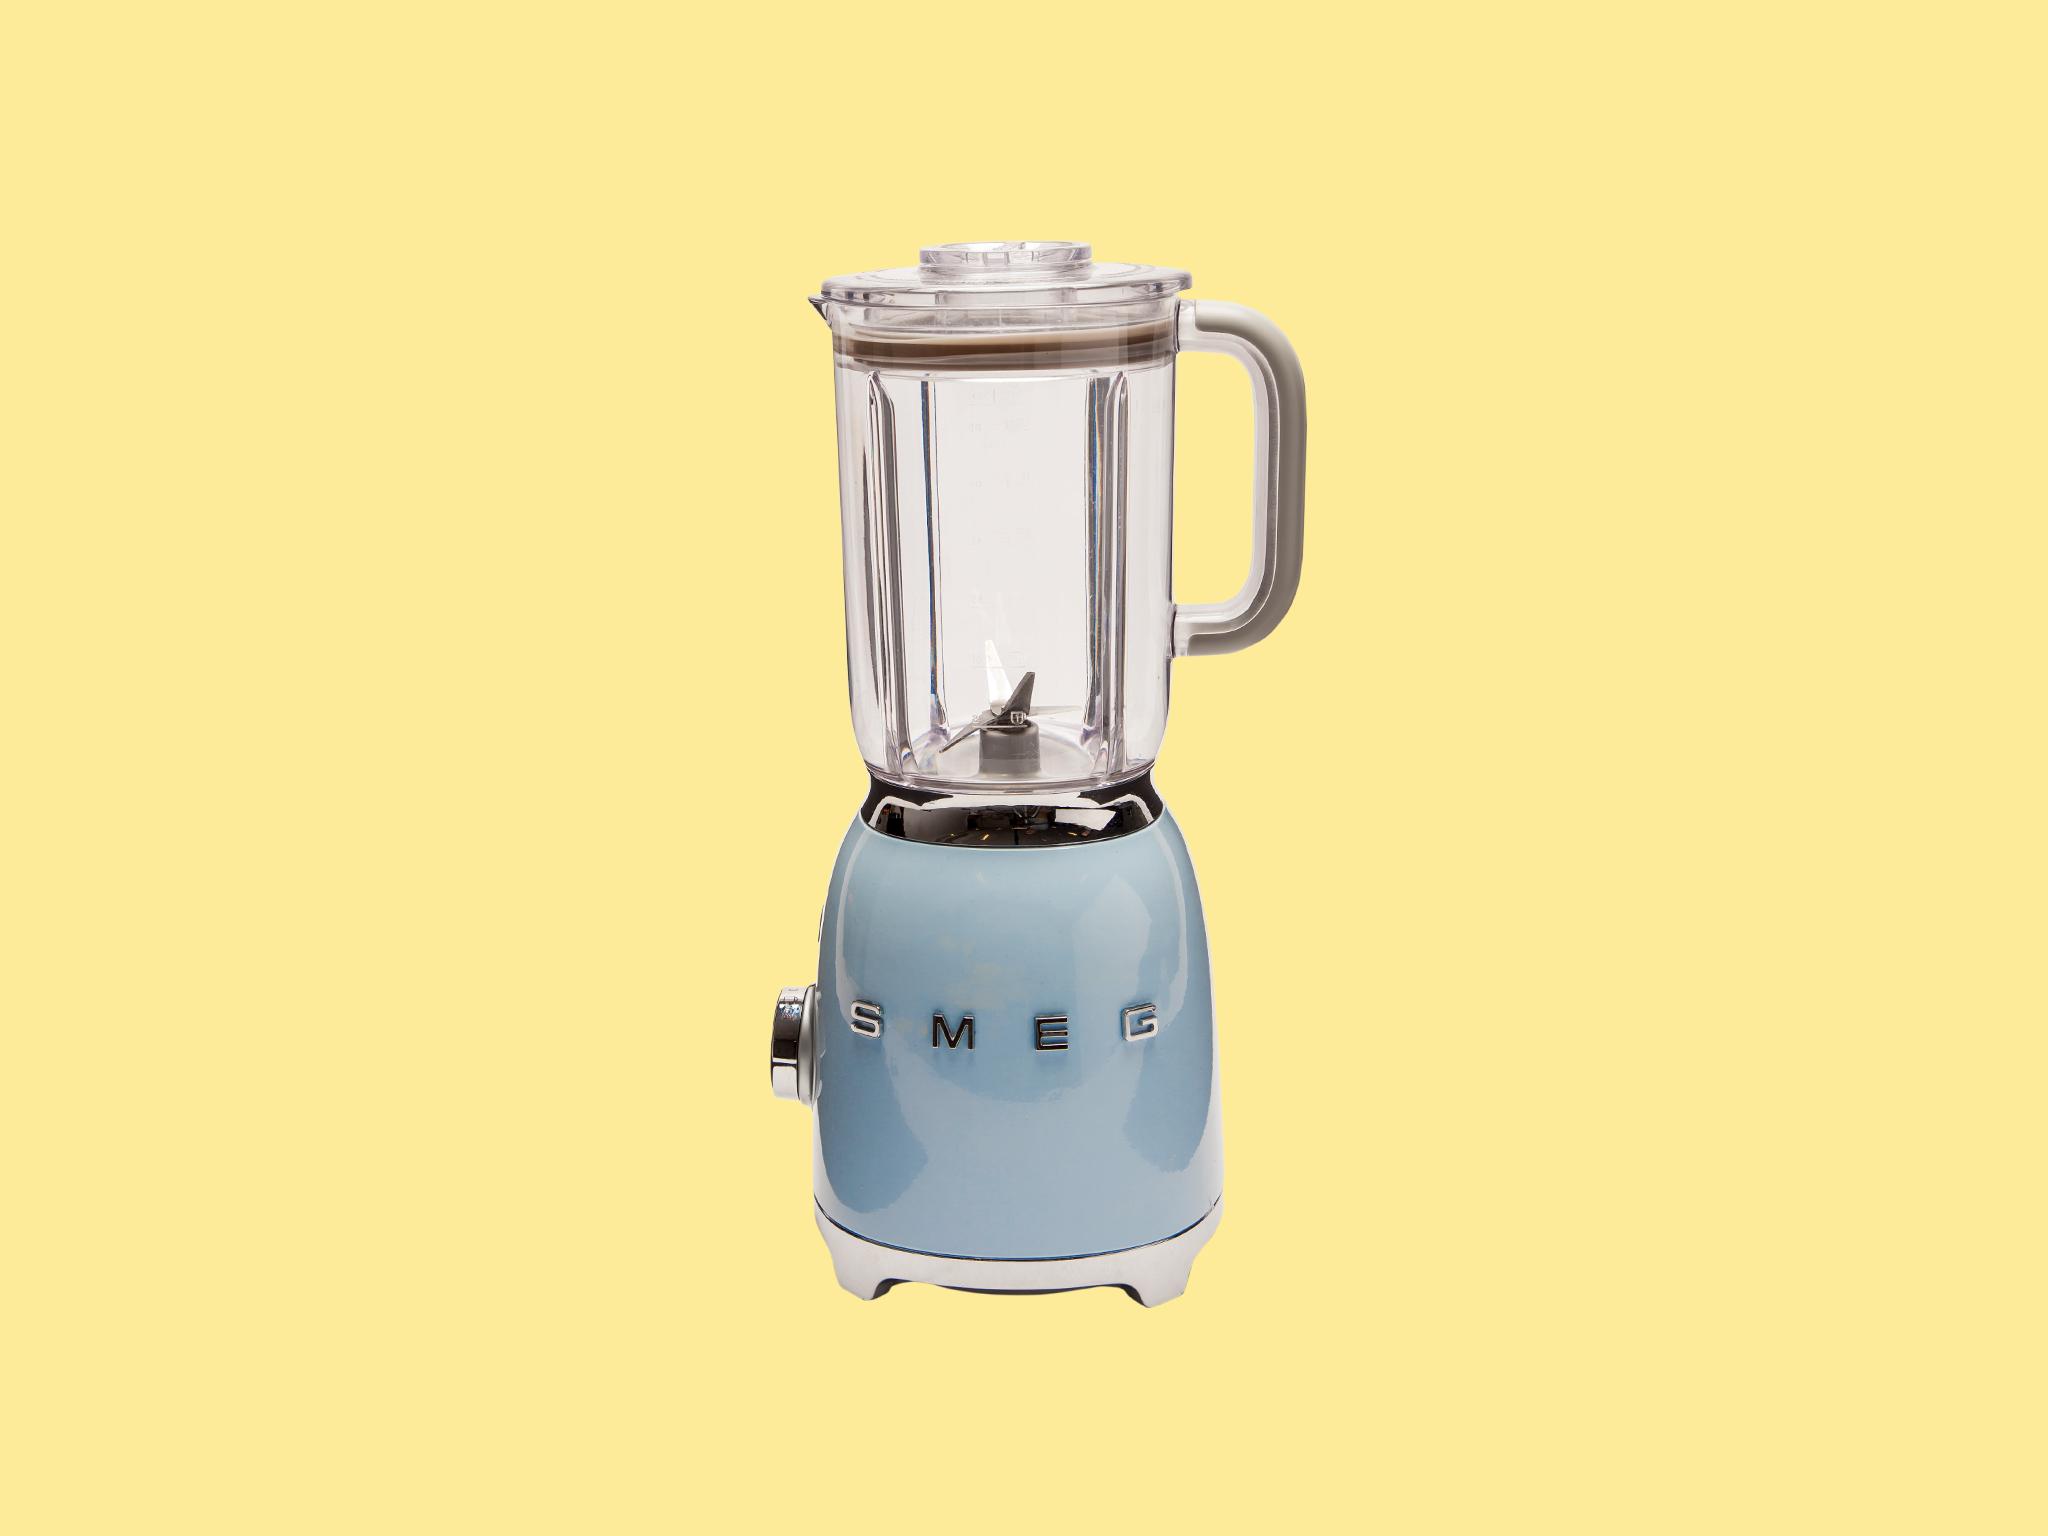 Smeg BLF01 food blender